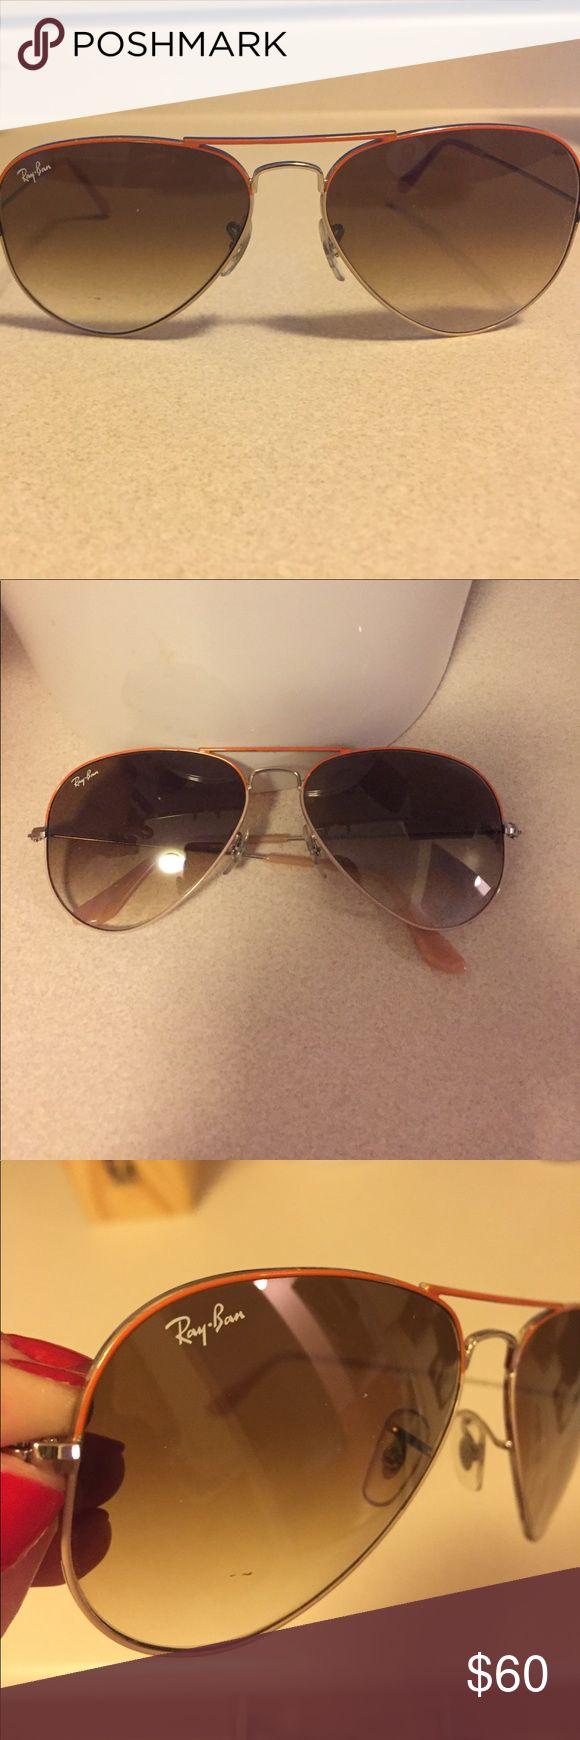 Ray-Ban Aviator sunglasses with orange trim Ray-Ban Aviator sunglasses with orange trim Ray-Ban Accessories Sunglasses